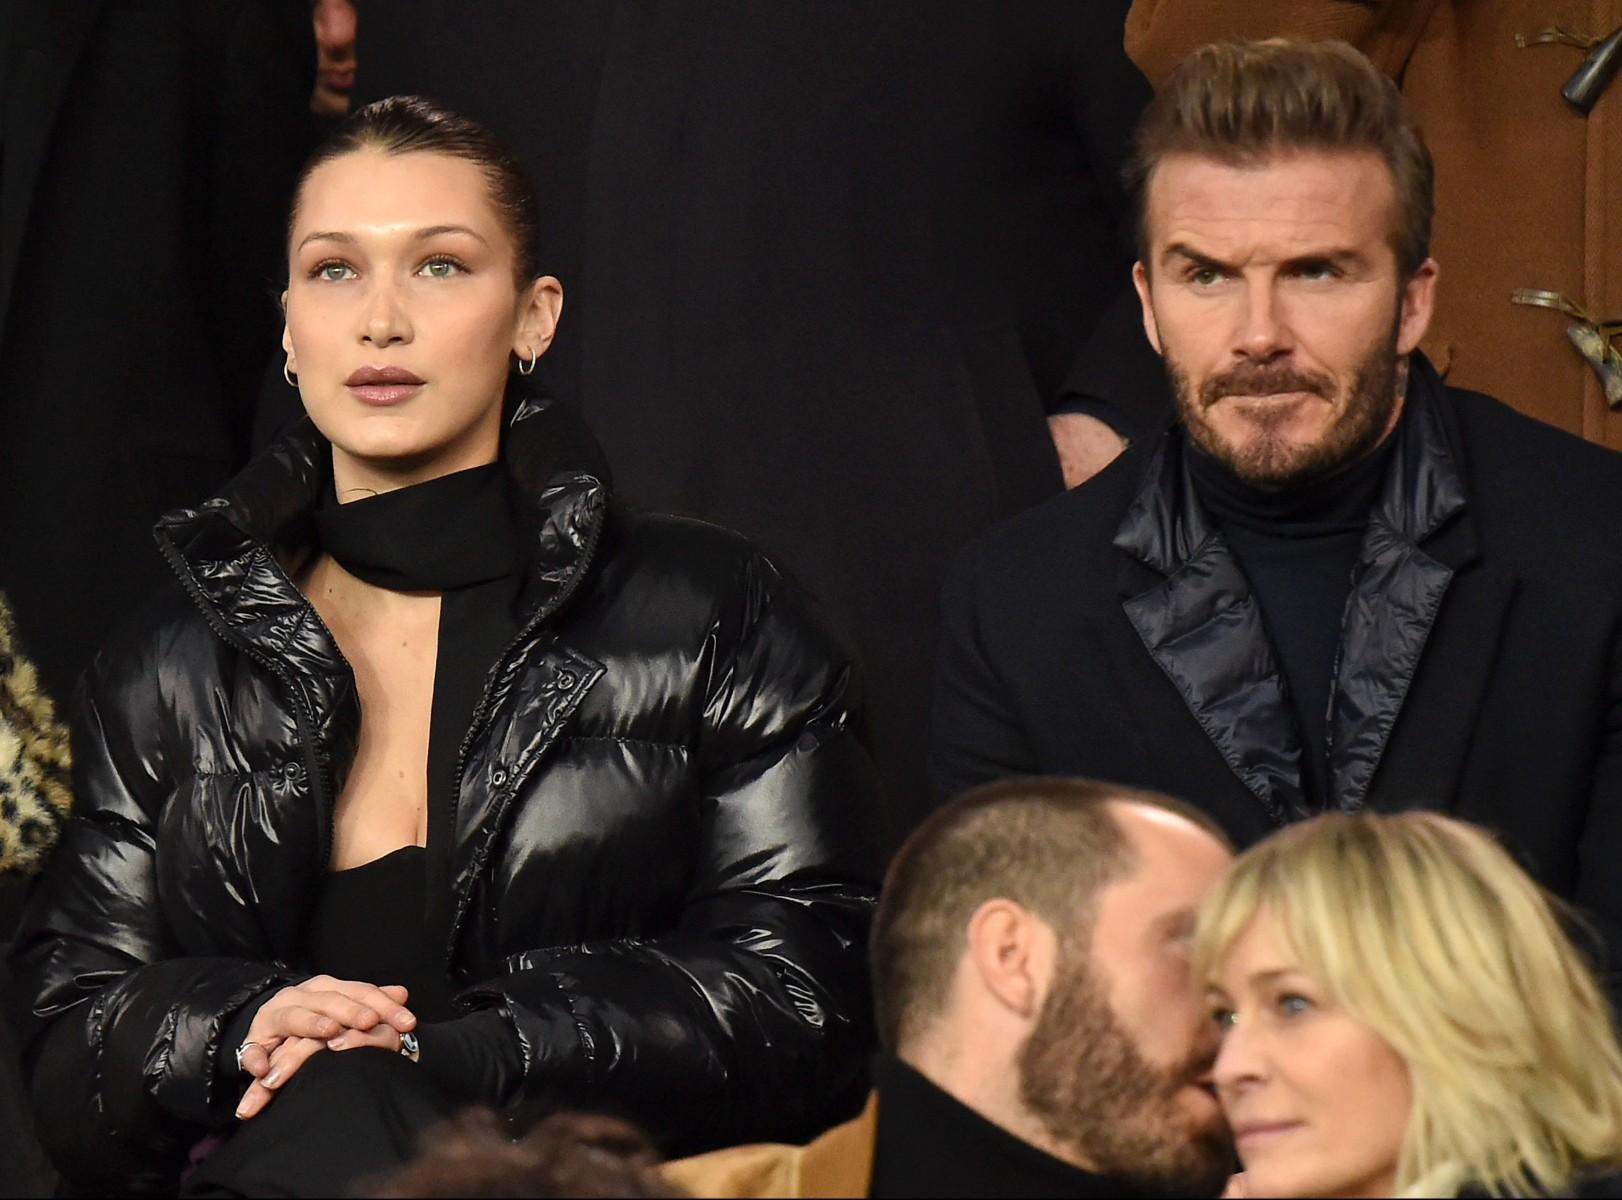 Gigi Hadids sister Bella has also been seen at PSG sitting next to David Beckham